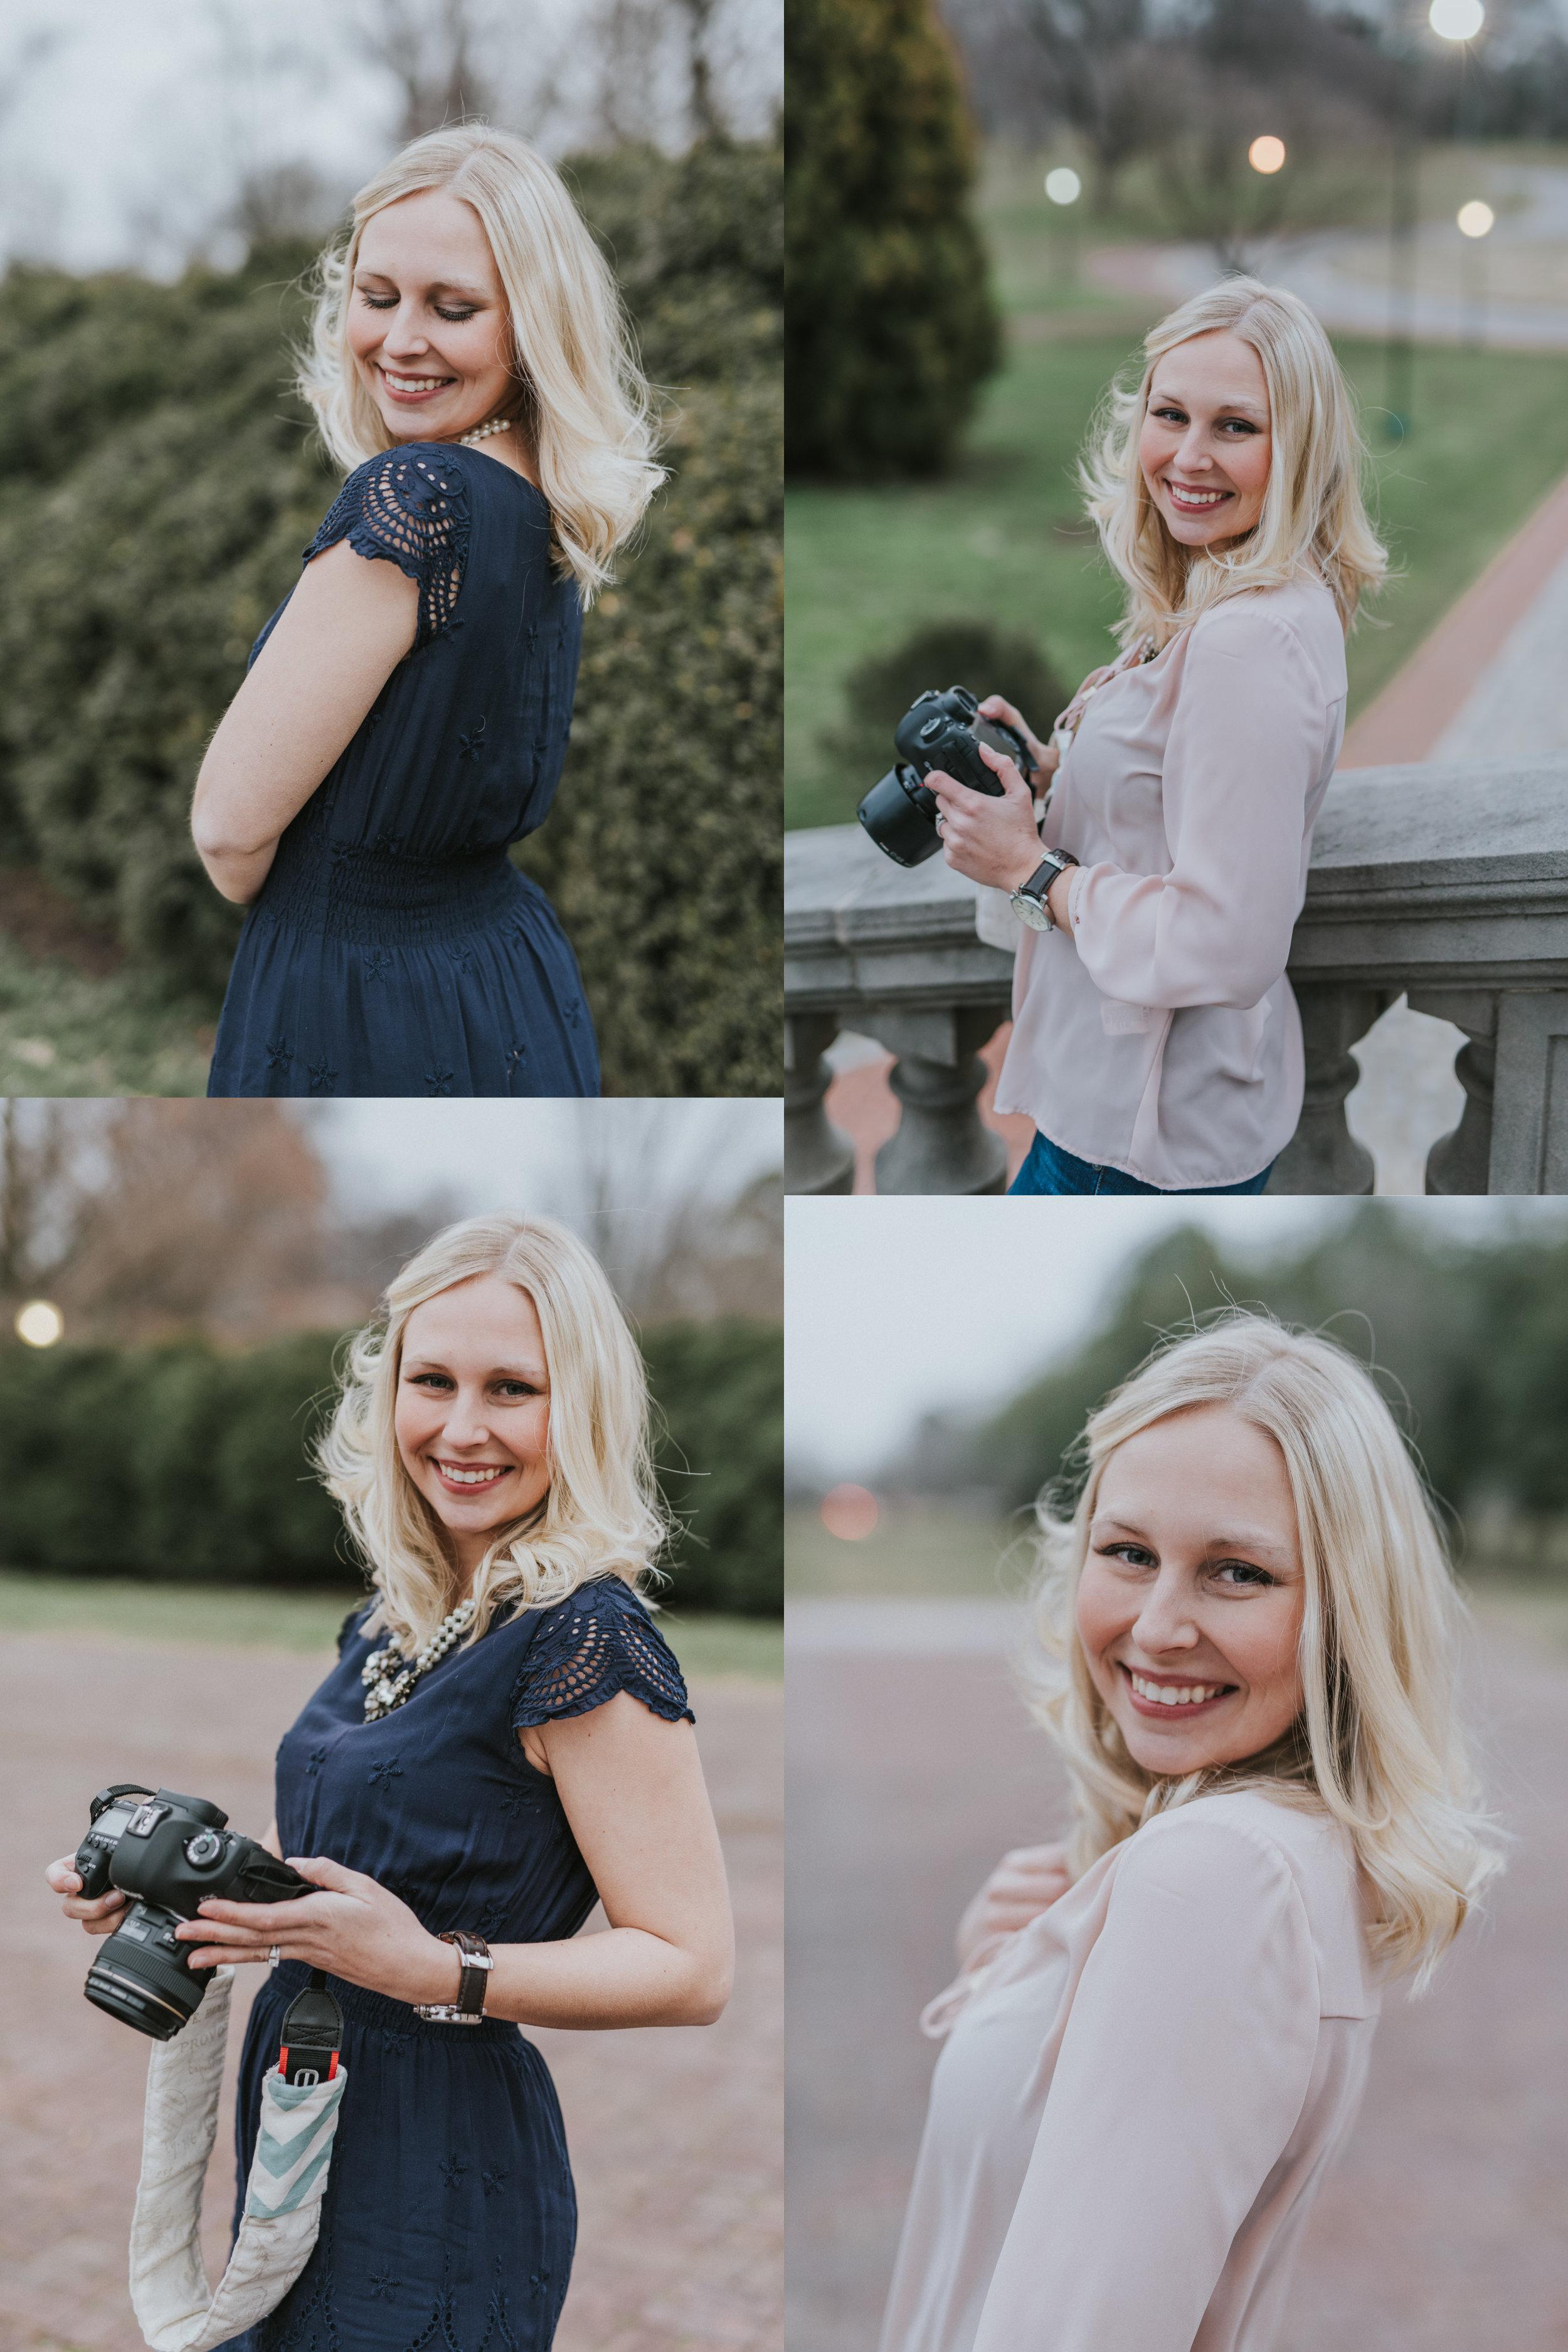 Richmond Portrait Photographer - Arianna Belle Photography